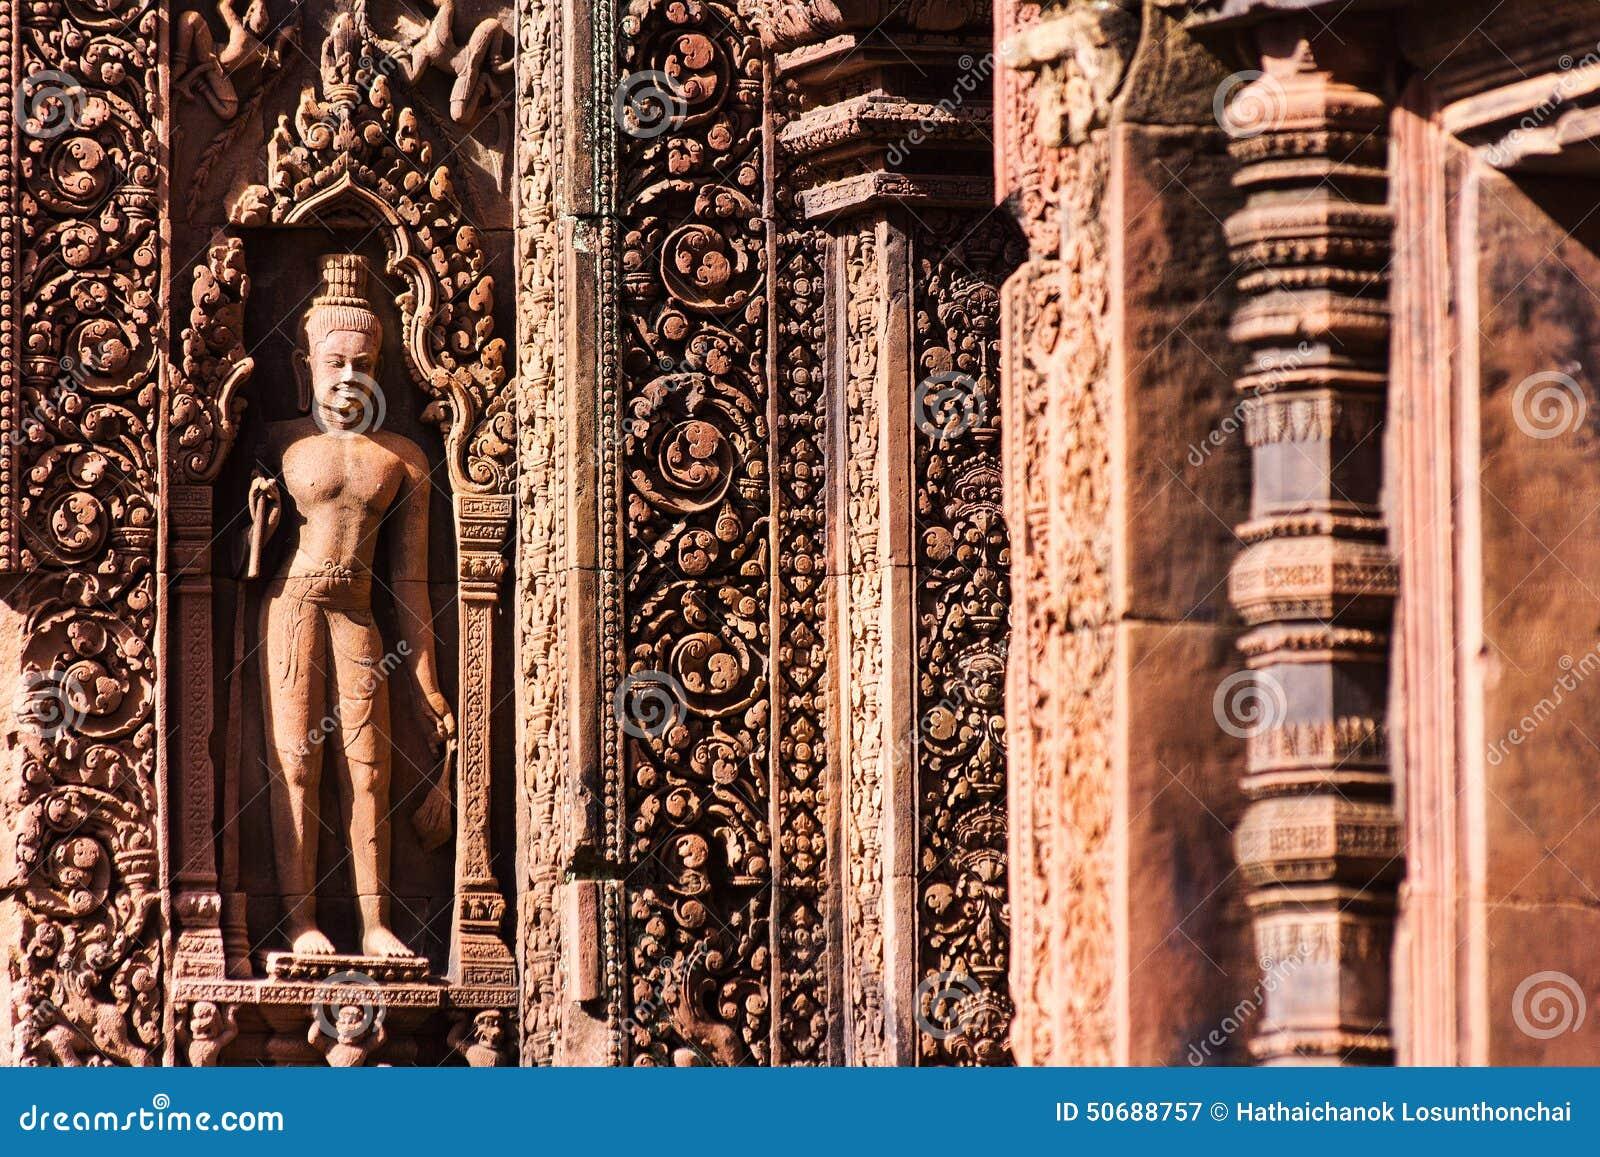 Download Banteay srei 库存图片. 图片 包括有 由于, 红色, 陶瓷, 寺庙, 被使昏迷的, 砂岩, 现代 - 50688757